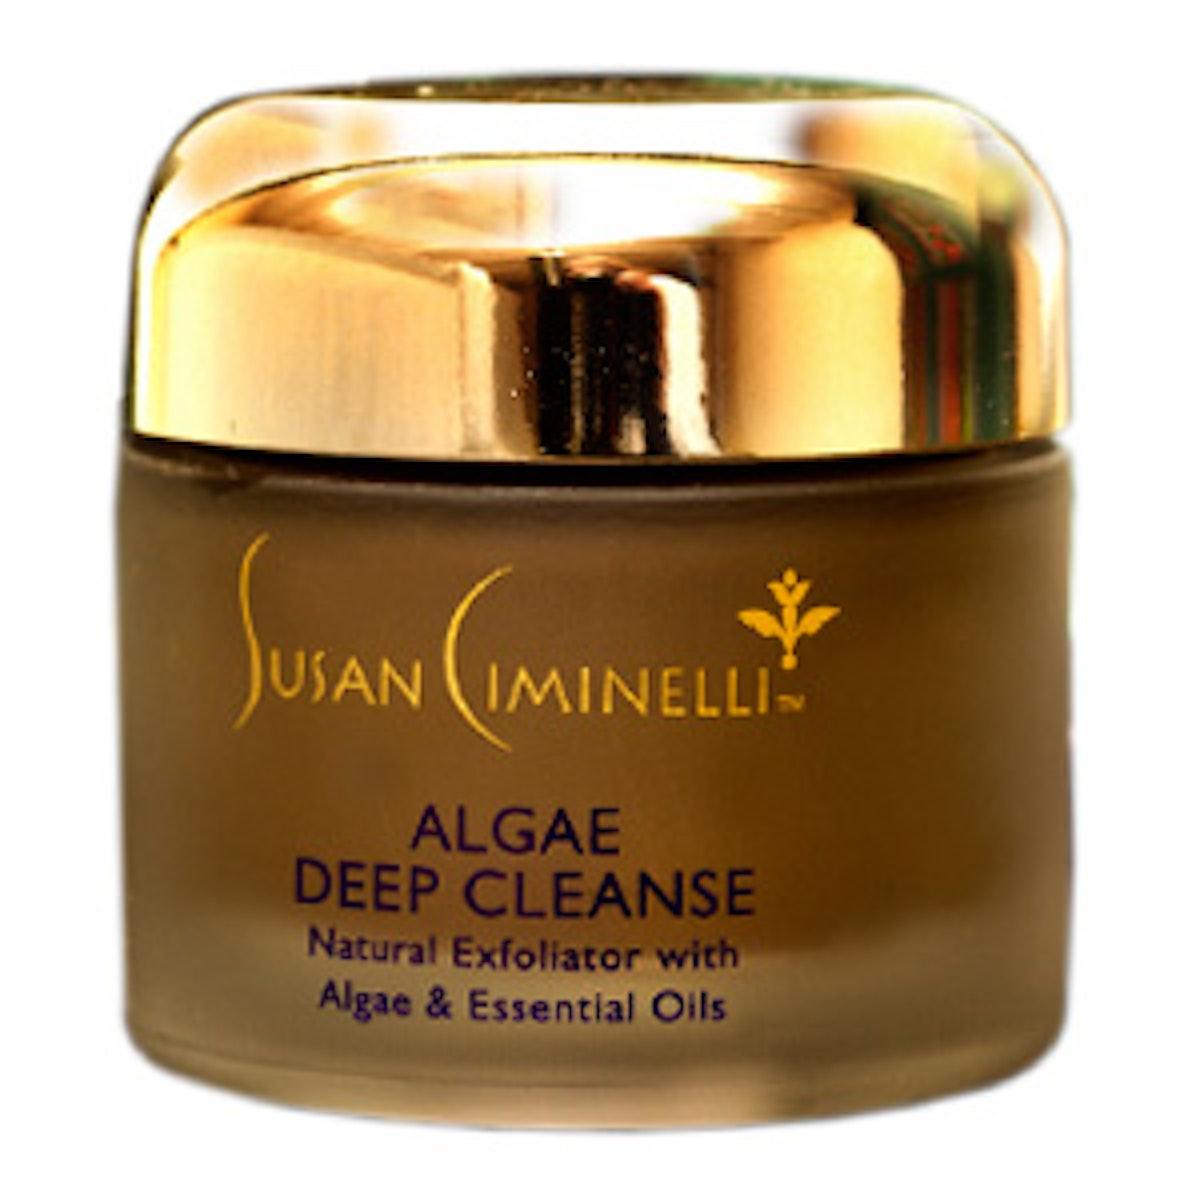 Algae Deep Cleanse